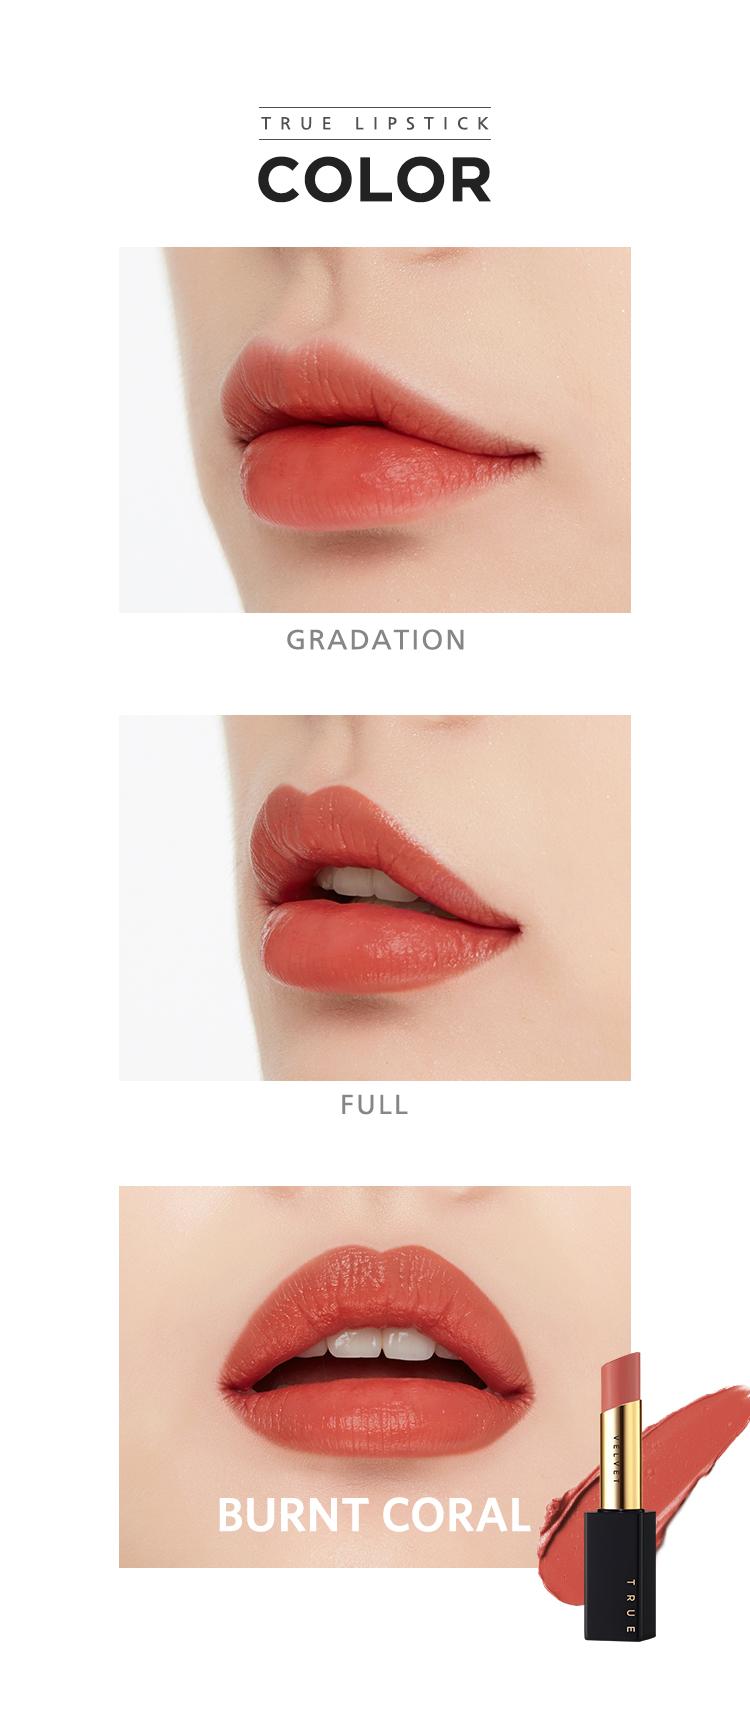 APIEU_True_Velvet_Lipstick_bf_CR02_02.jpg